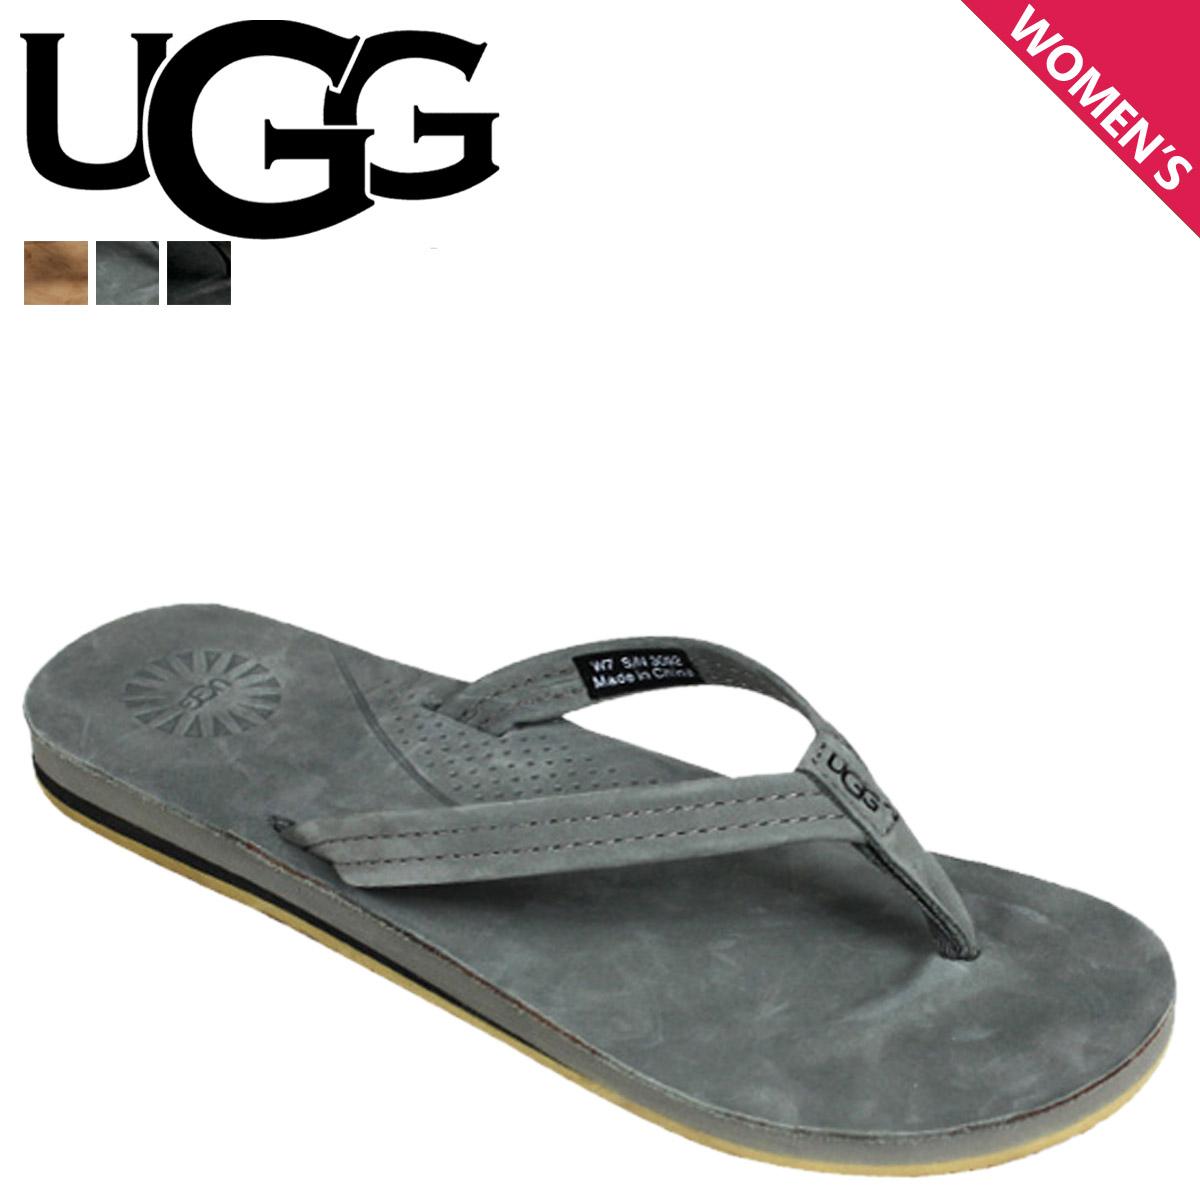 whats up sports ugg ugg kayla sandals flip flops womens kayla 3092 rh global rakuten com